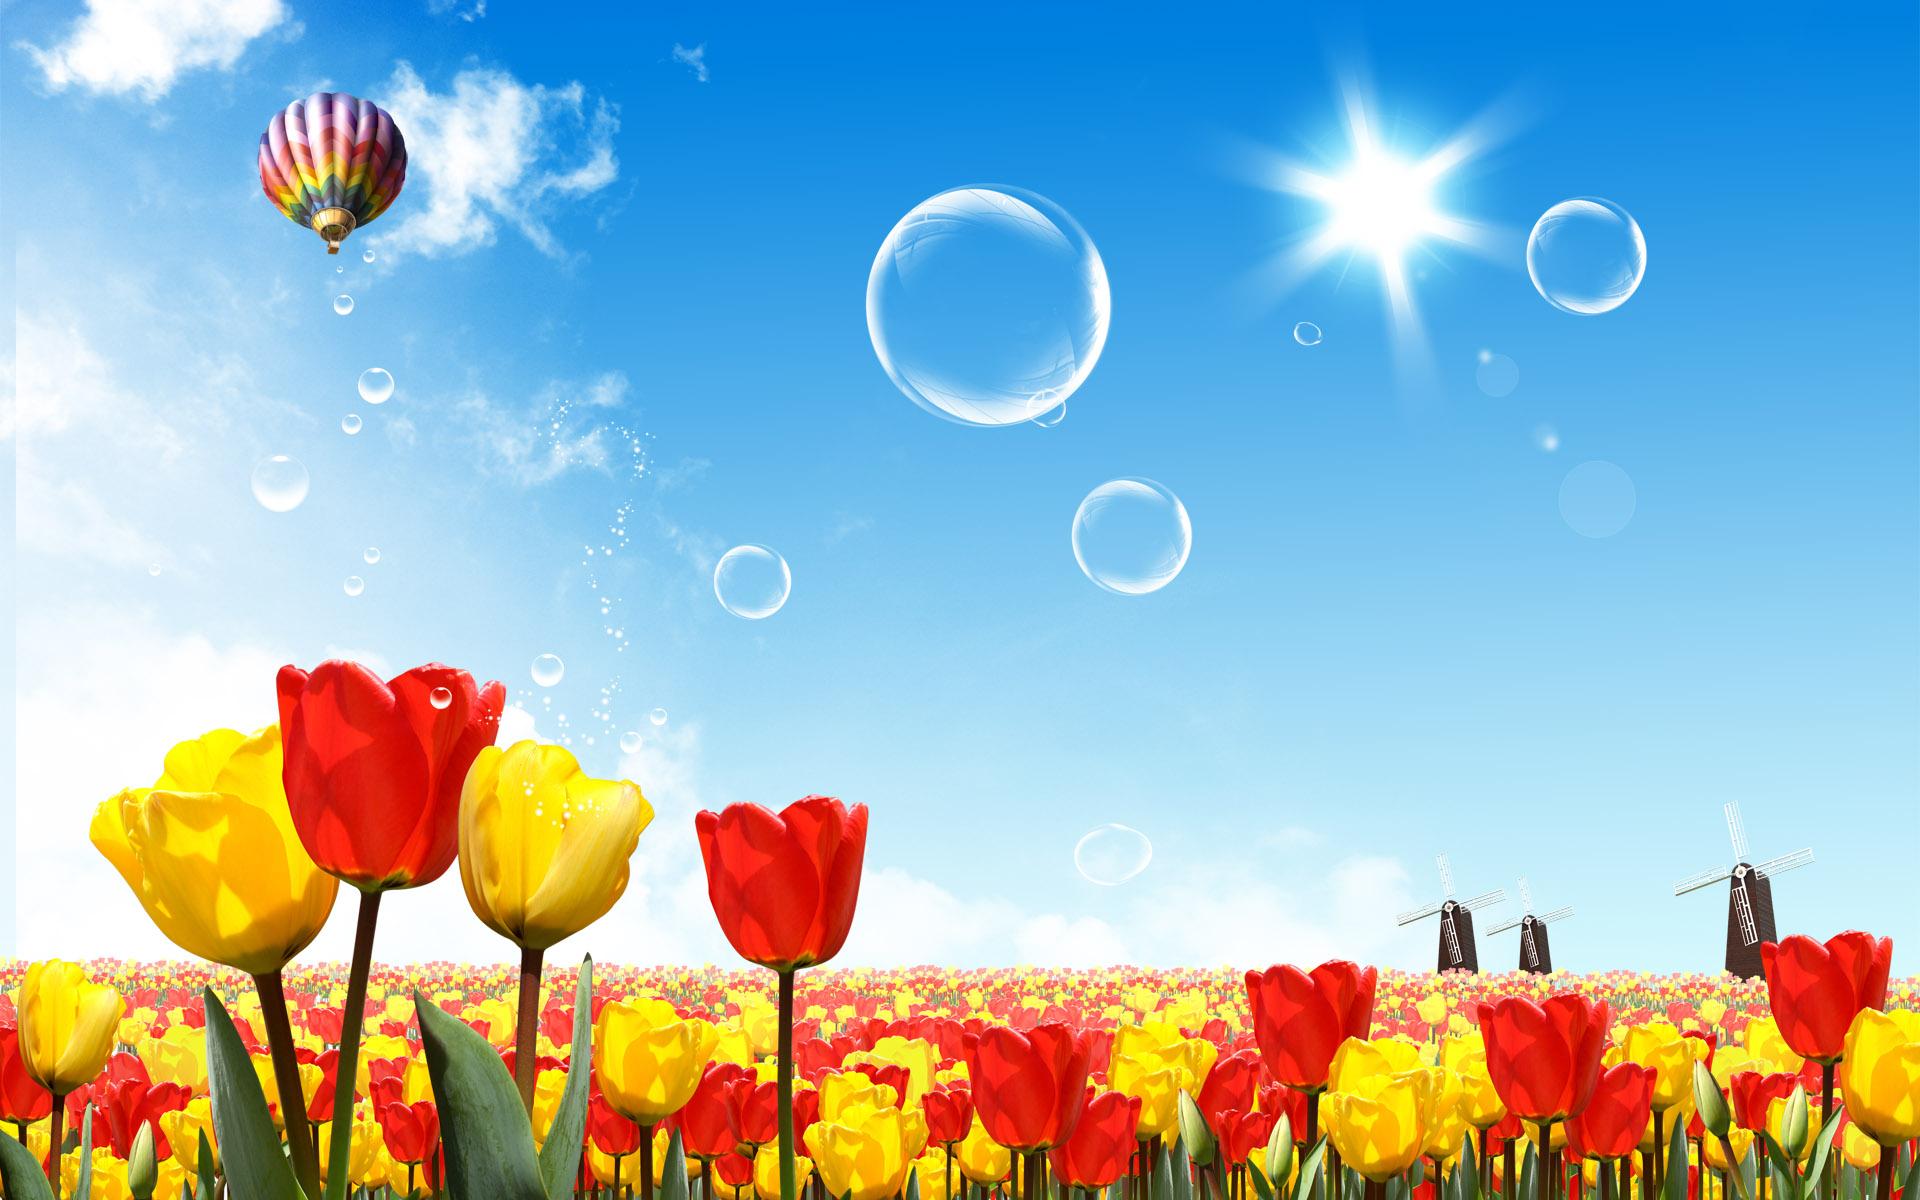 небо, солнце, лето, скачтаь фото, цветы, маки, обои на рабочий стол